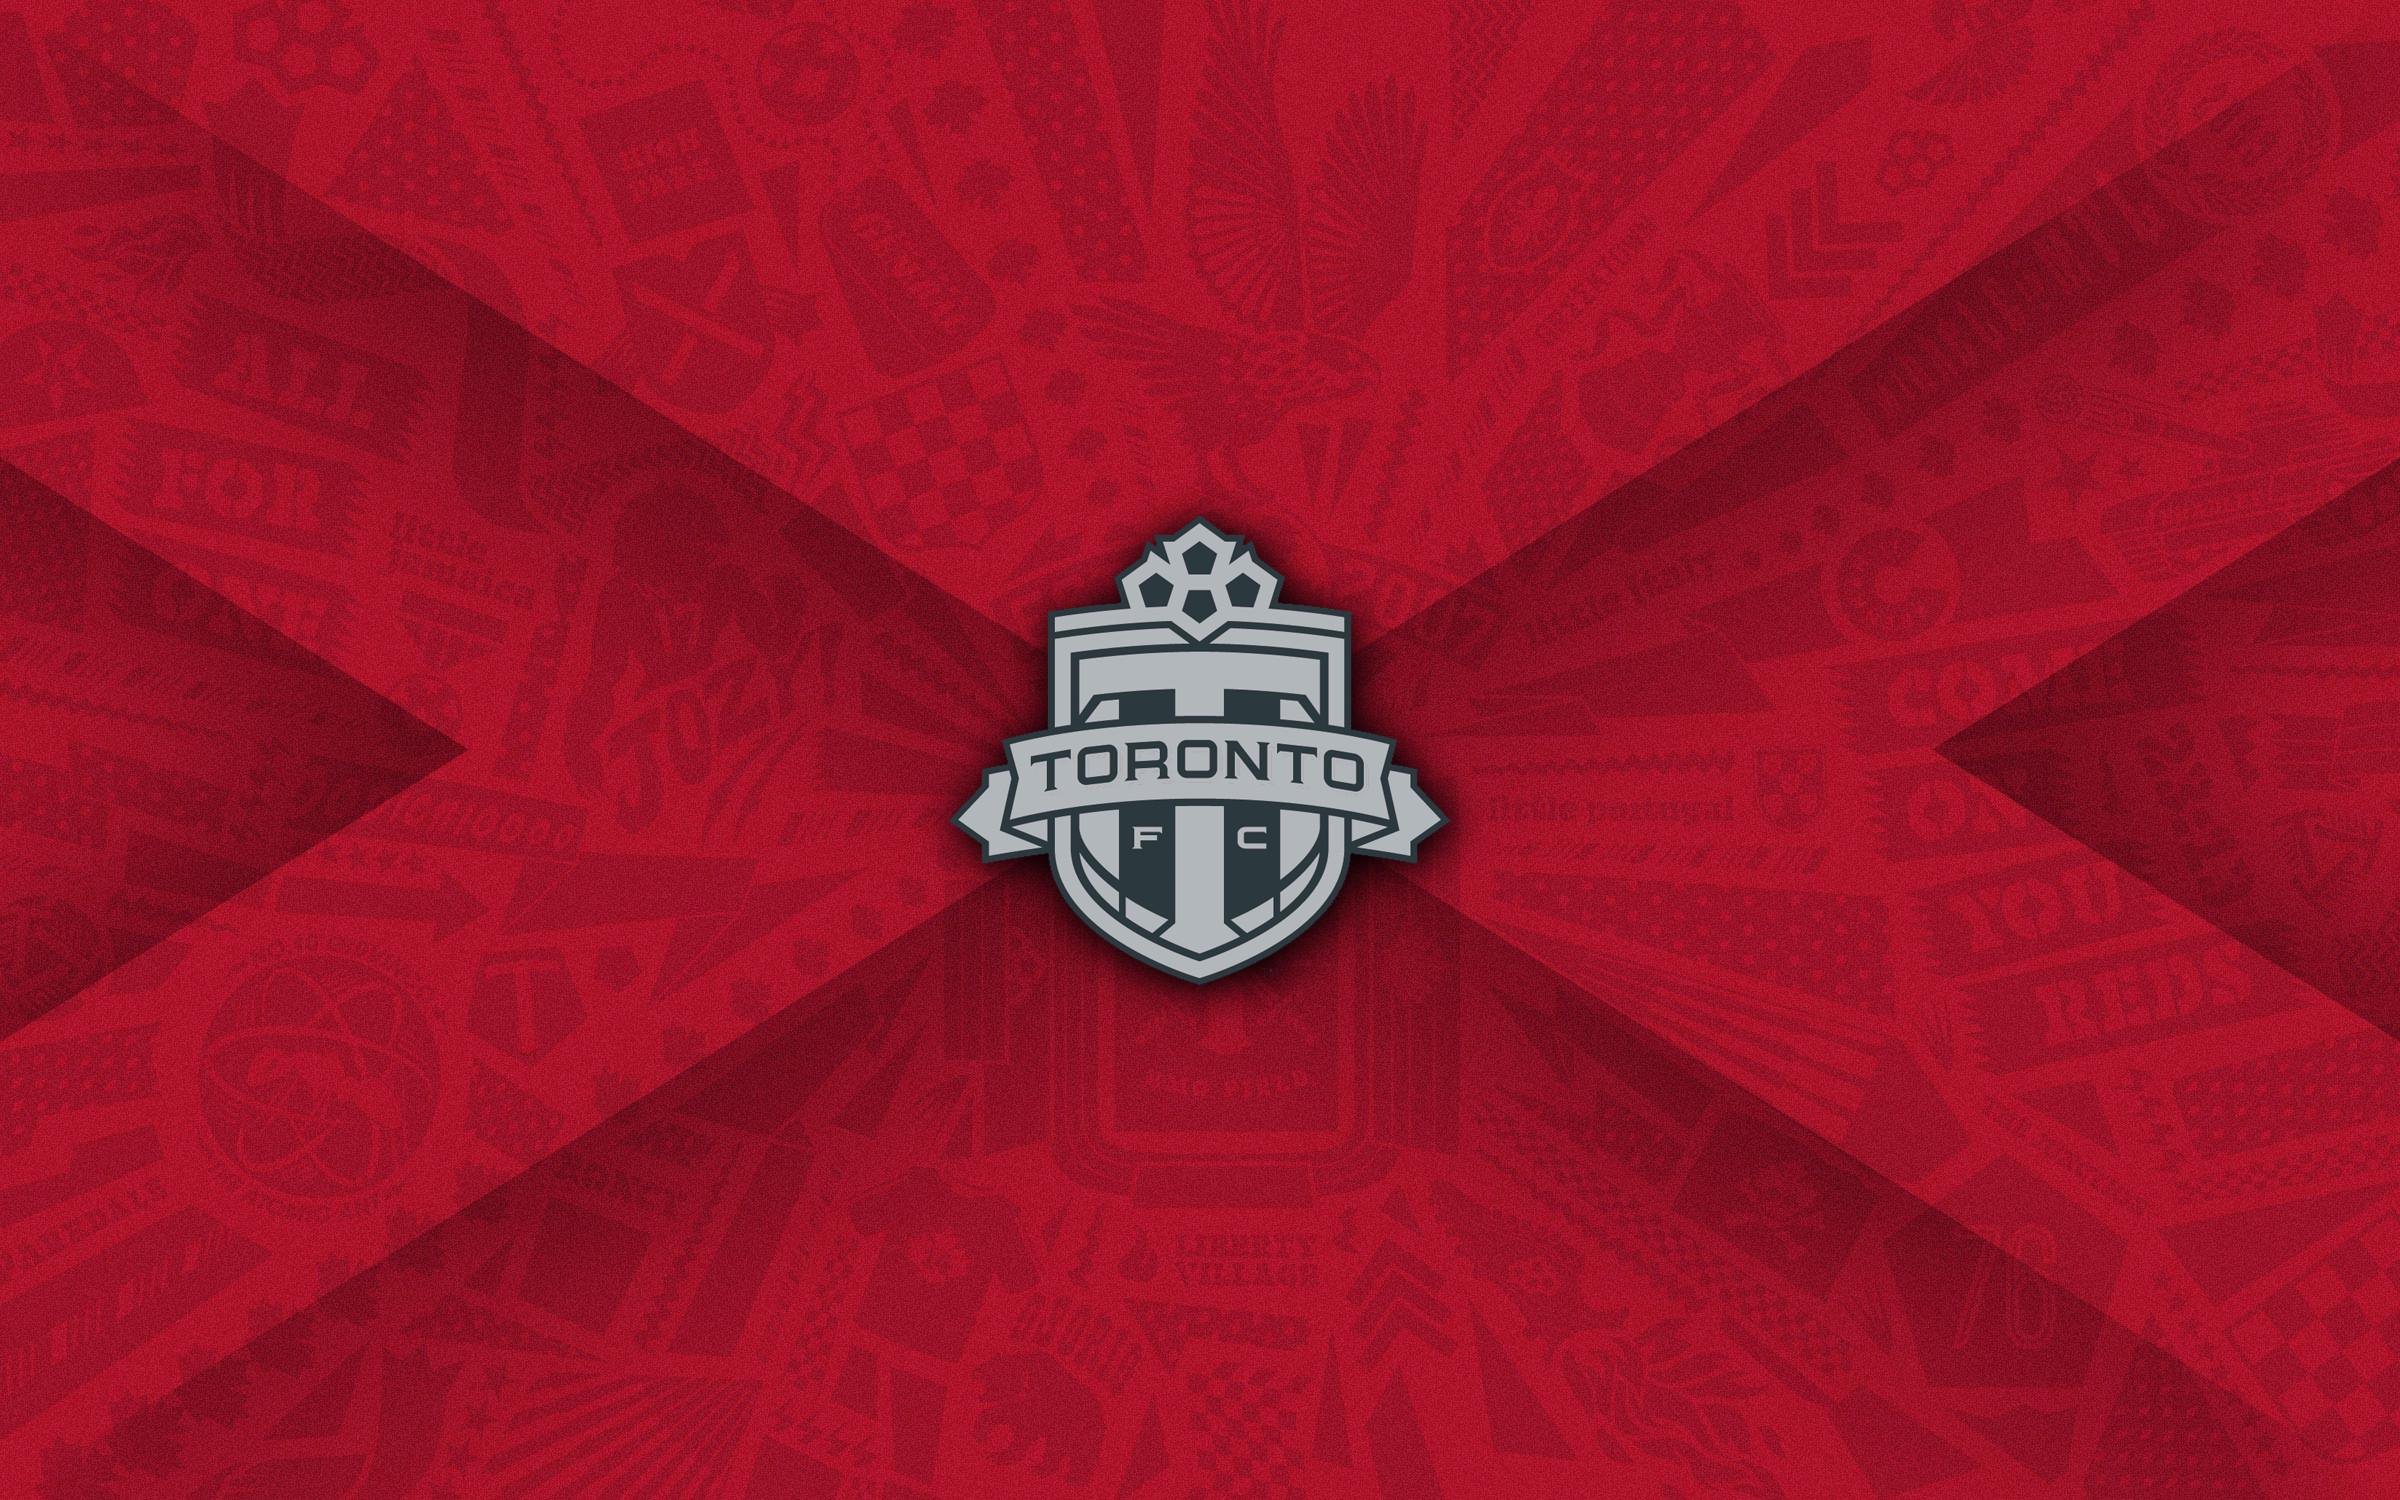 Toronto FC 2016 Wallpaper tfc 2400x1500